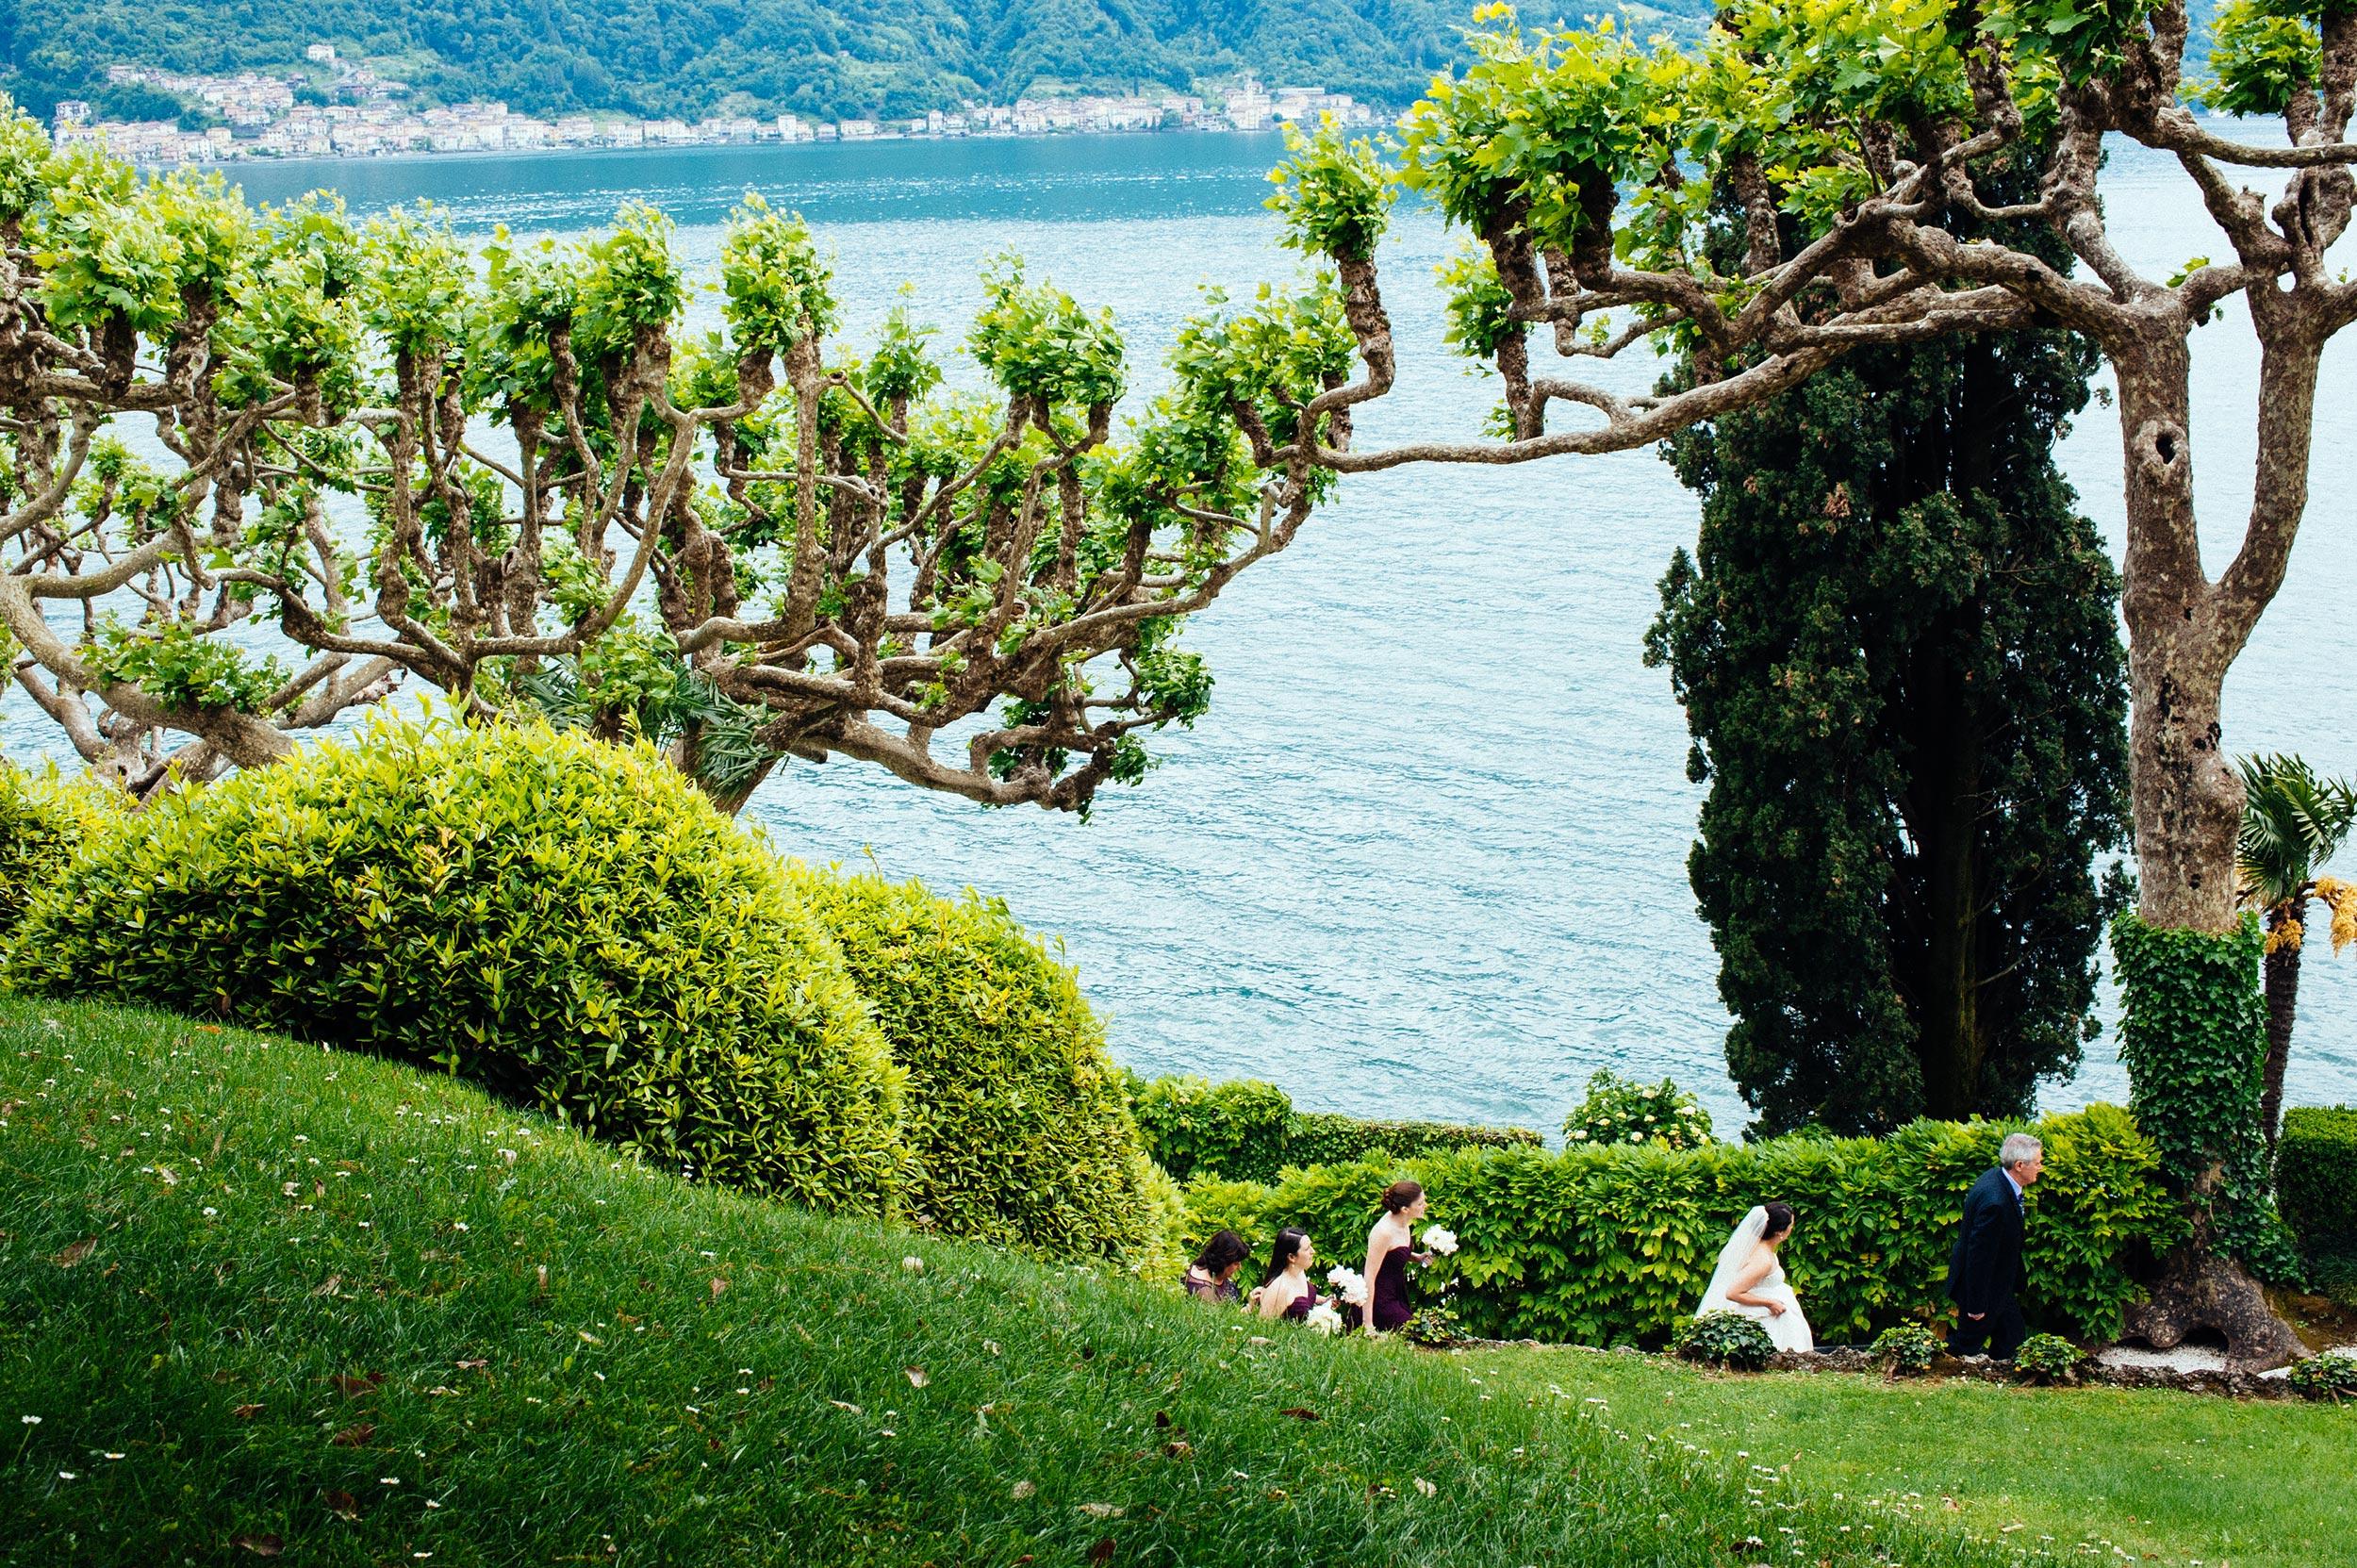 2015-Jon-Lauren-Bellagio-Lake-Como-Wedding-Photographer-Italy-Alessandro-Avenali-20.jpg